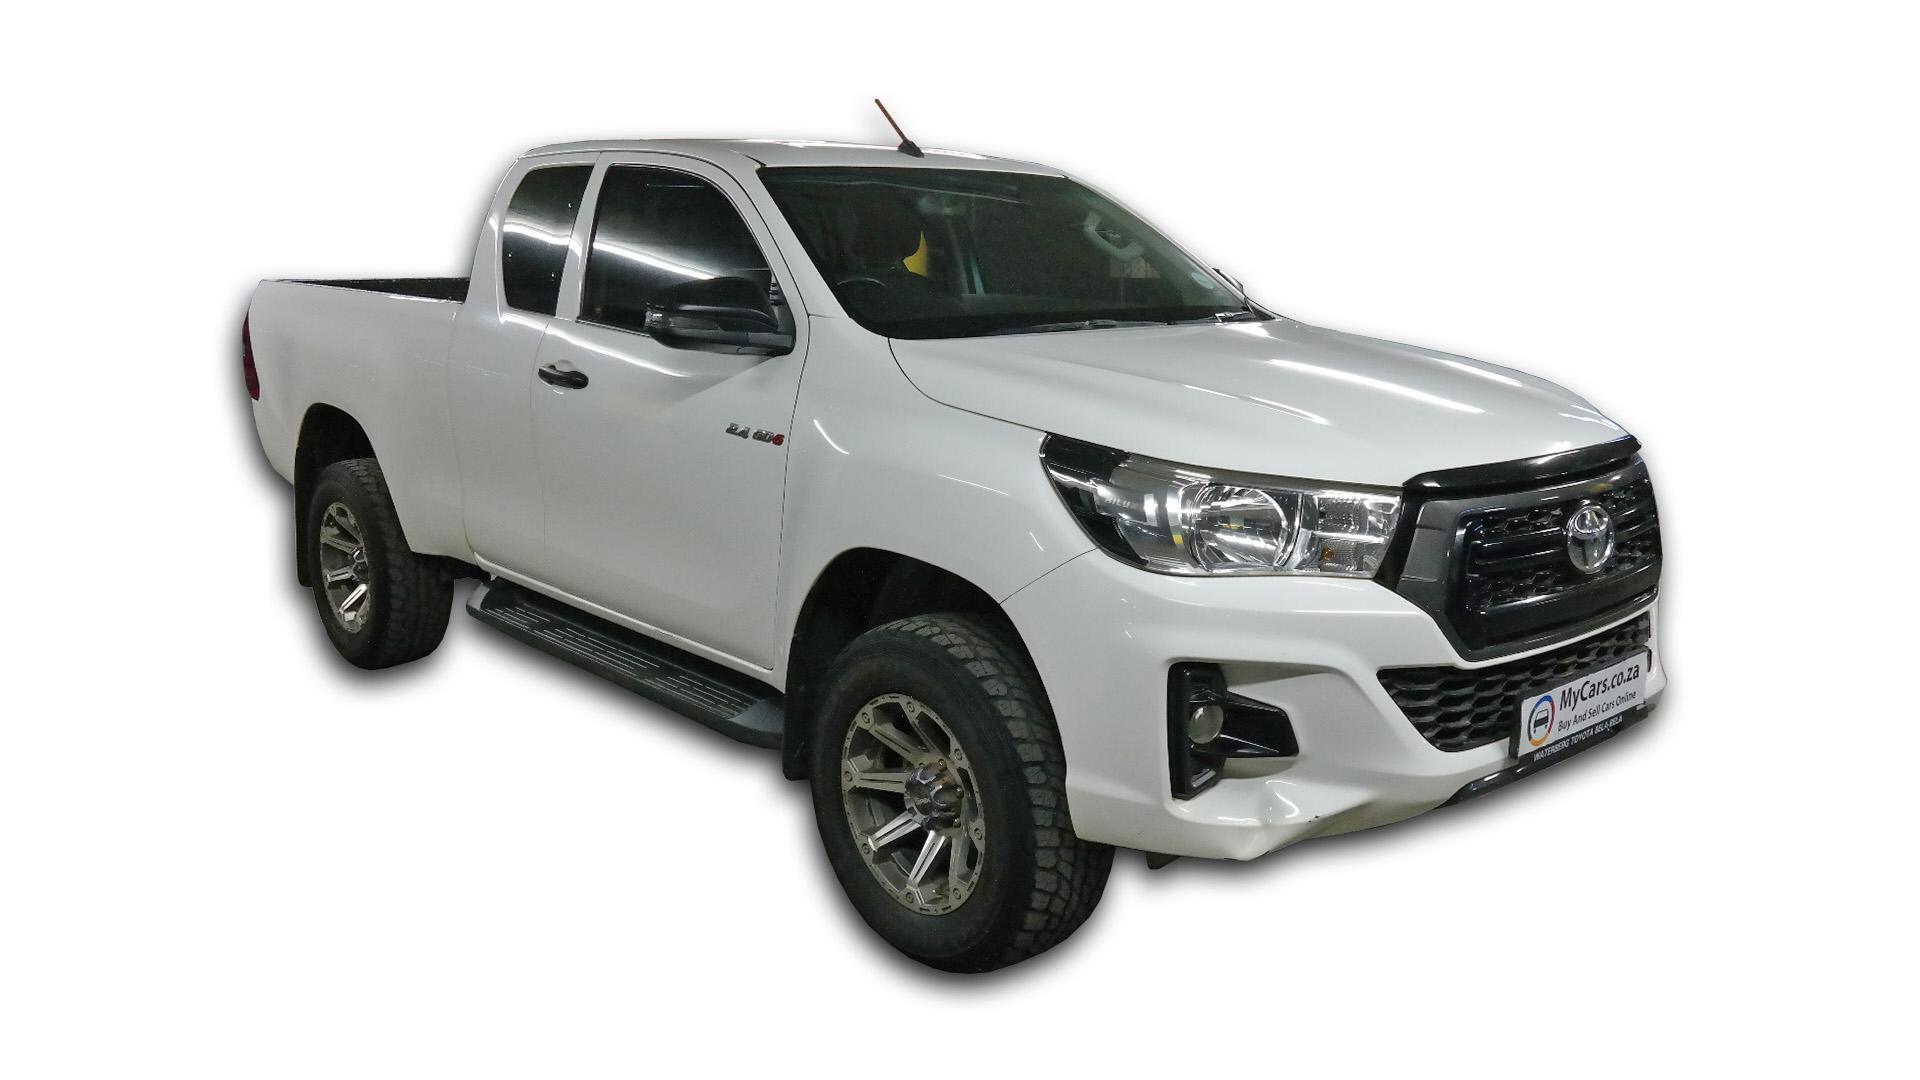 Toyota Hilux 2.4 GD-6 RB SRX P